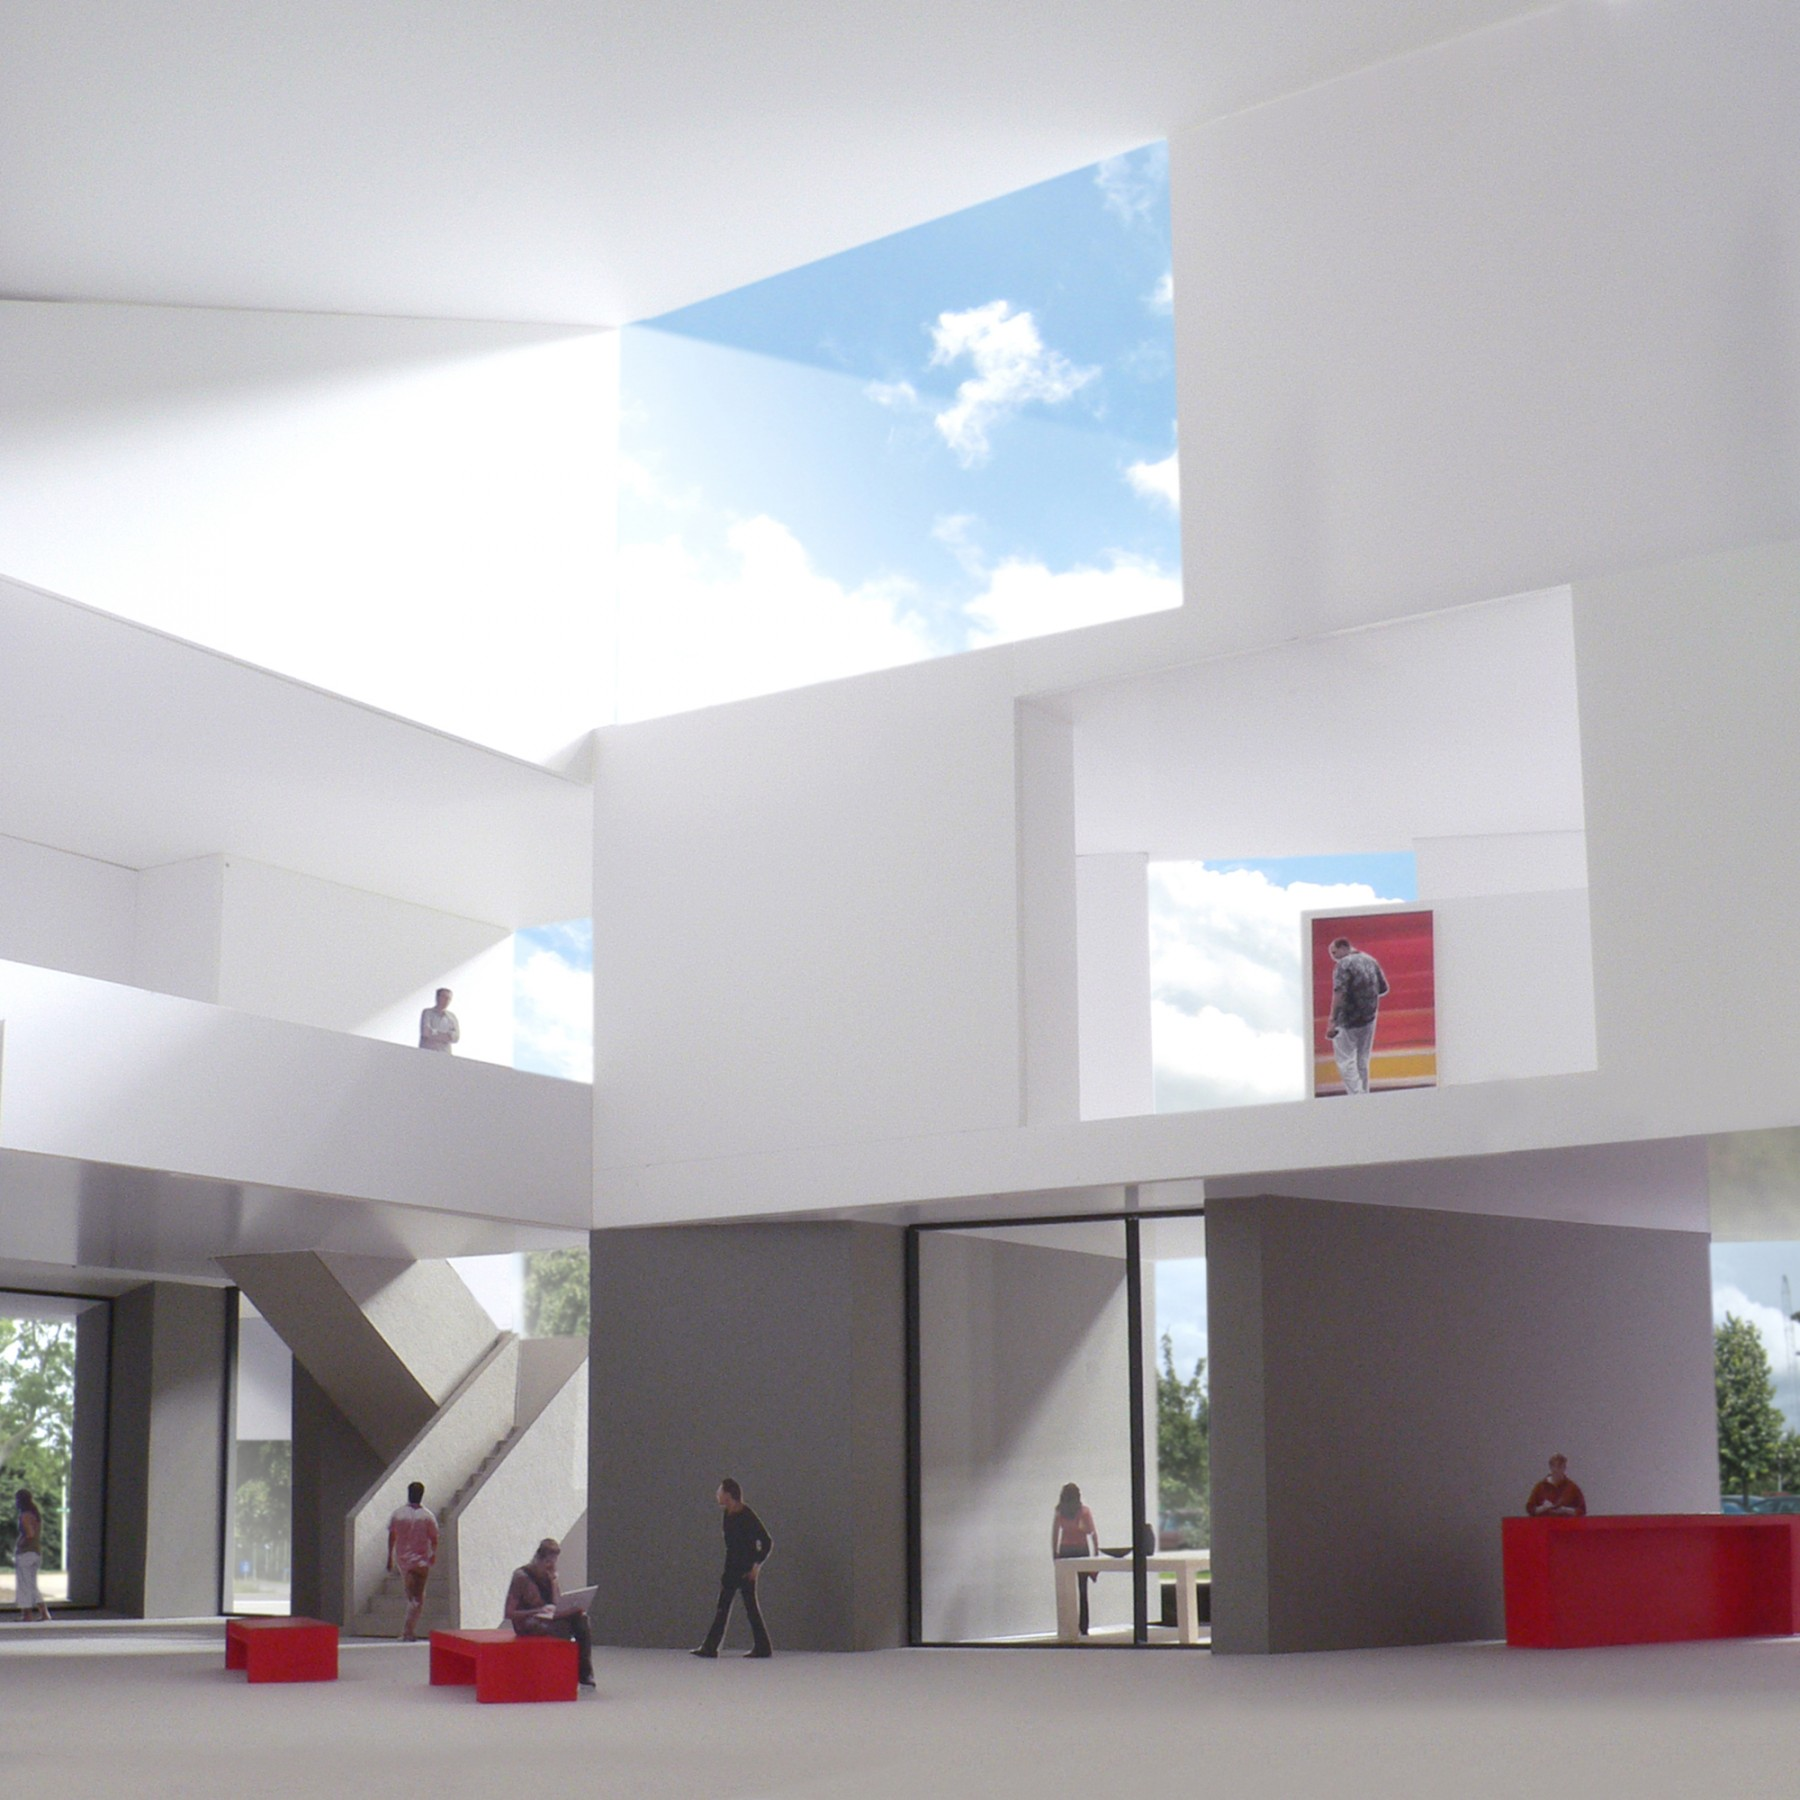 University-Bath-Creative-Arts-Centre-short-list-education-somerset-campus-theatre-Jamie-Fobert-architects-1